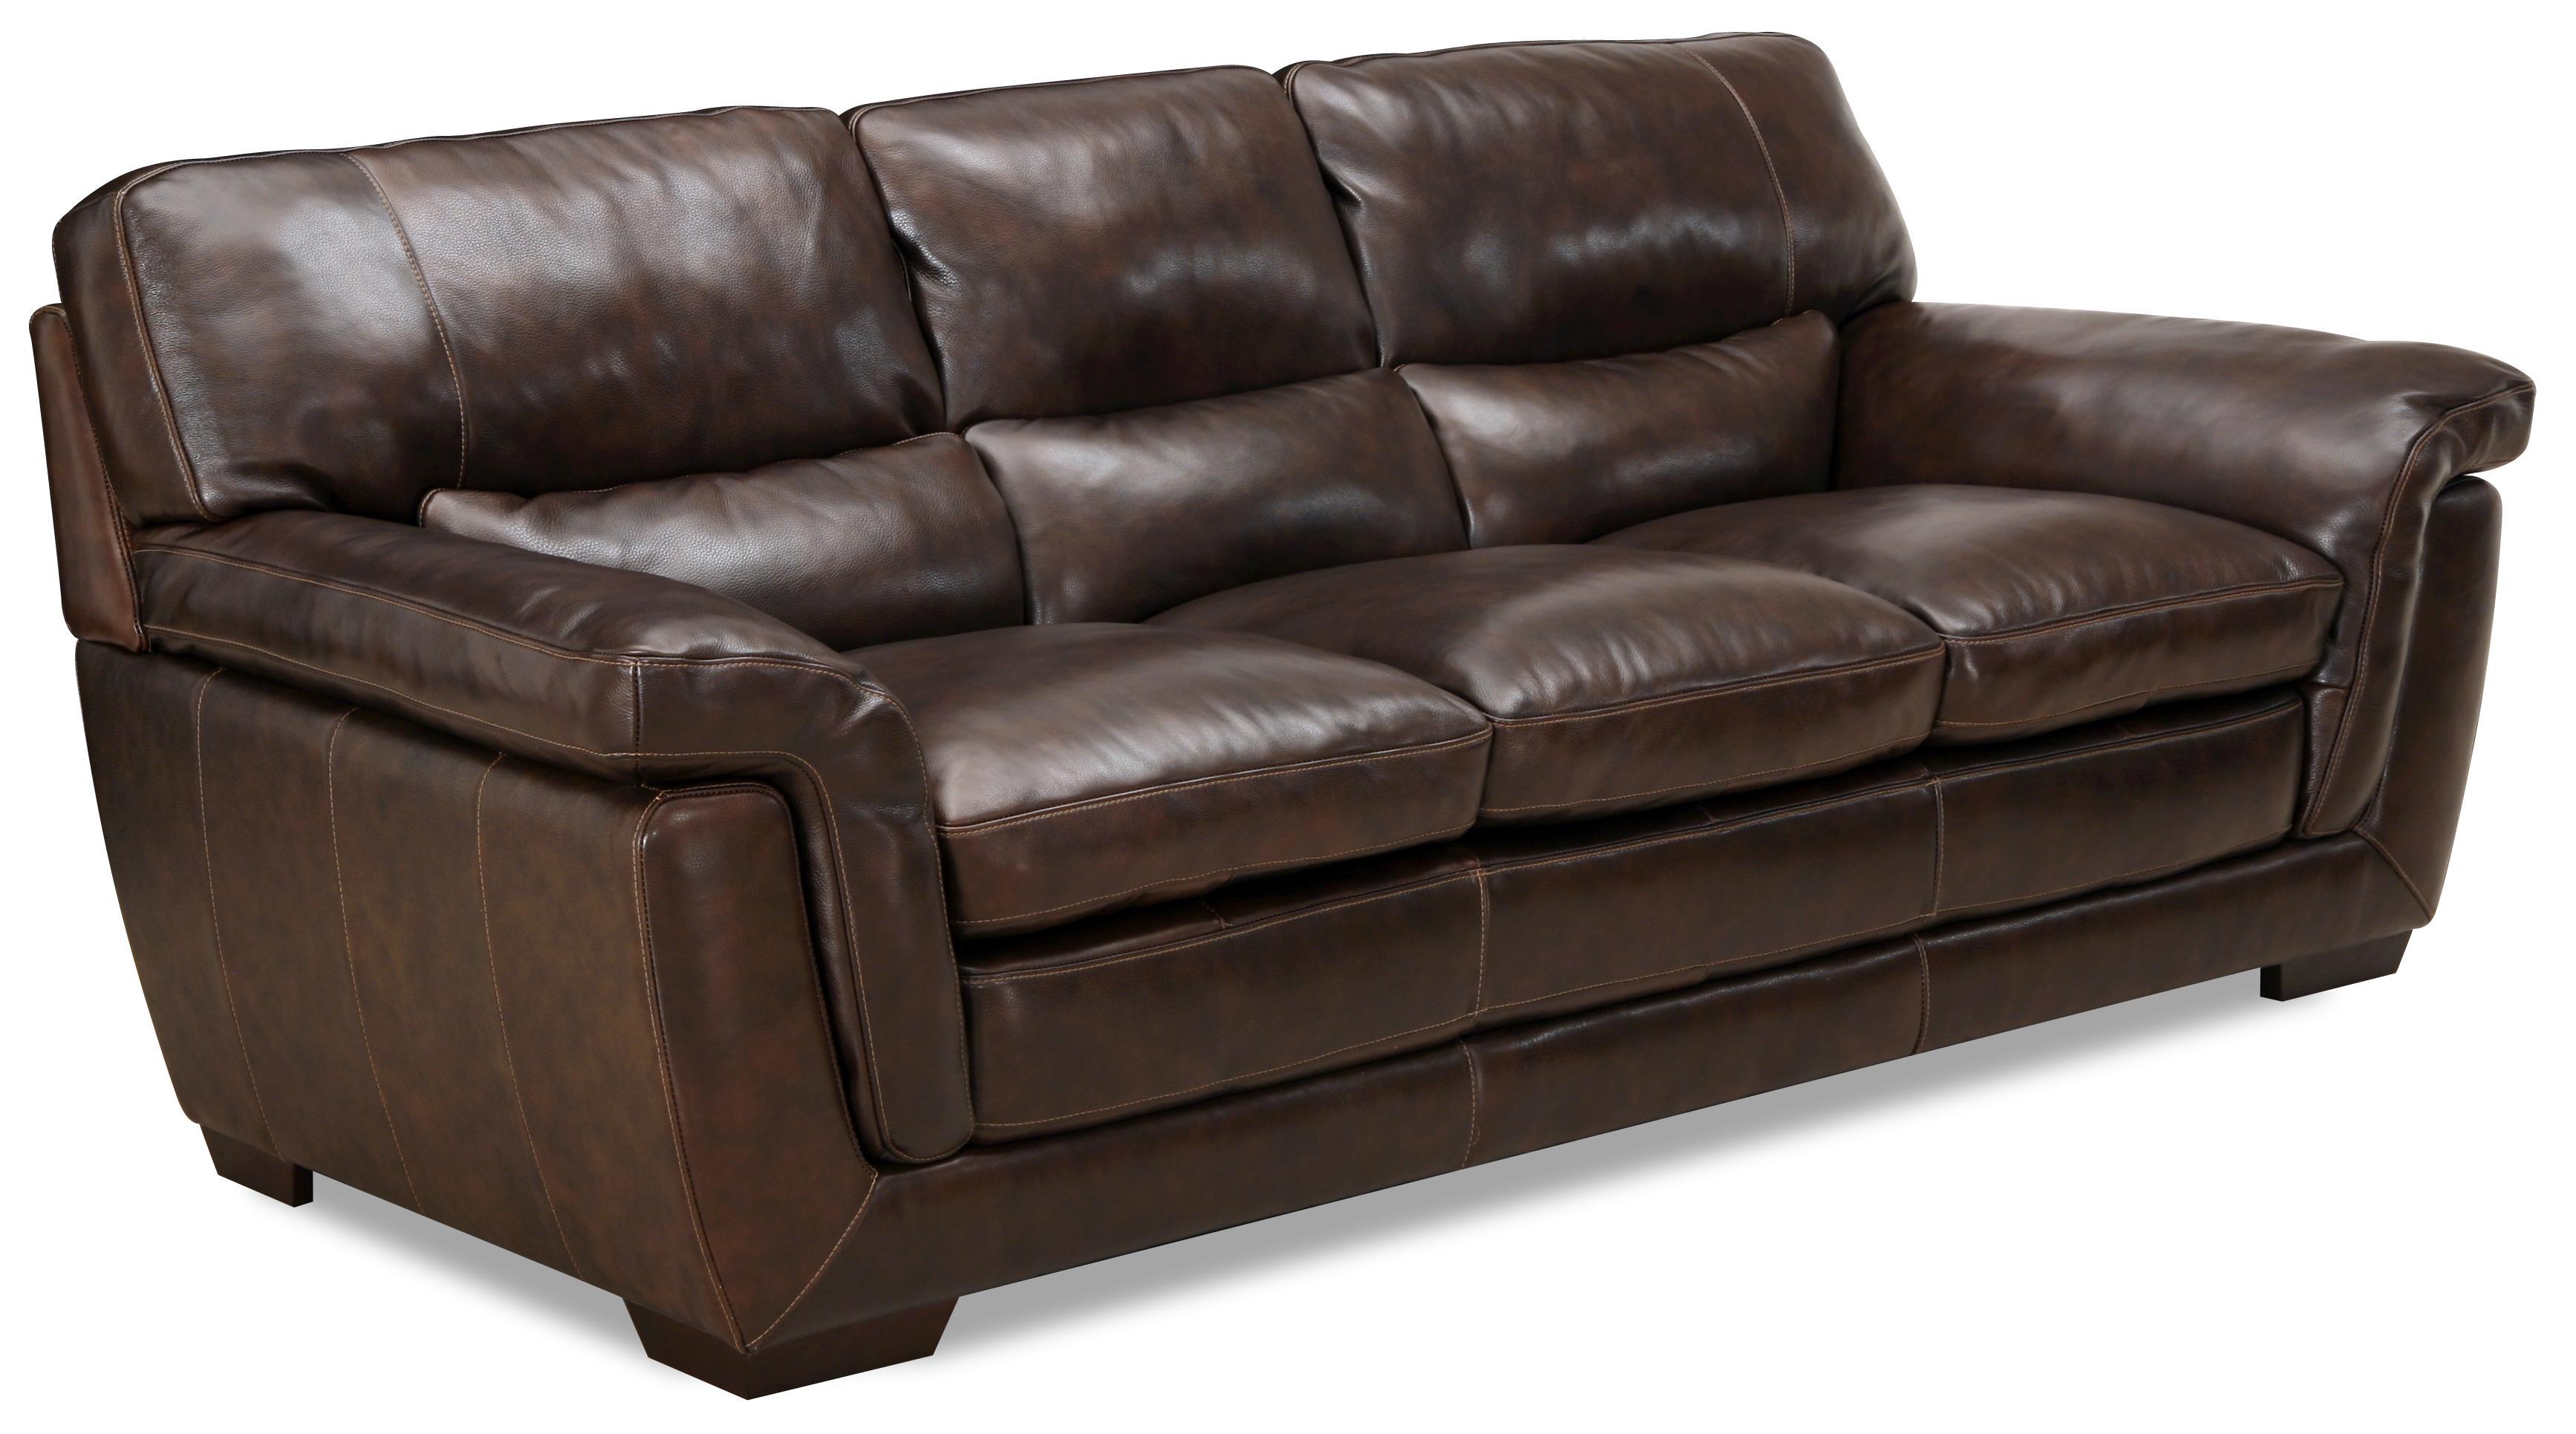 6956 Casual Leather Sofa by Simon Li at Dean Bosler's